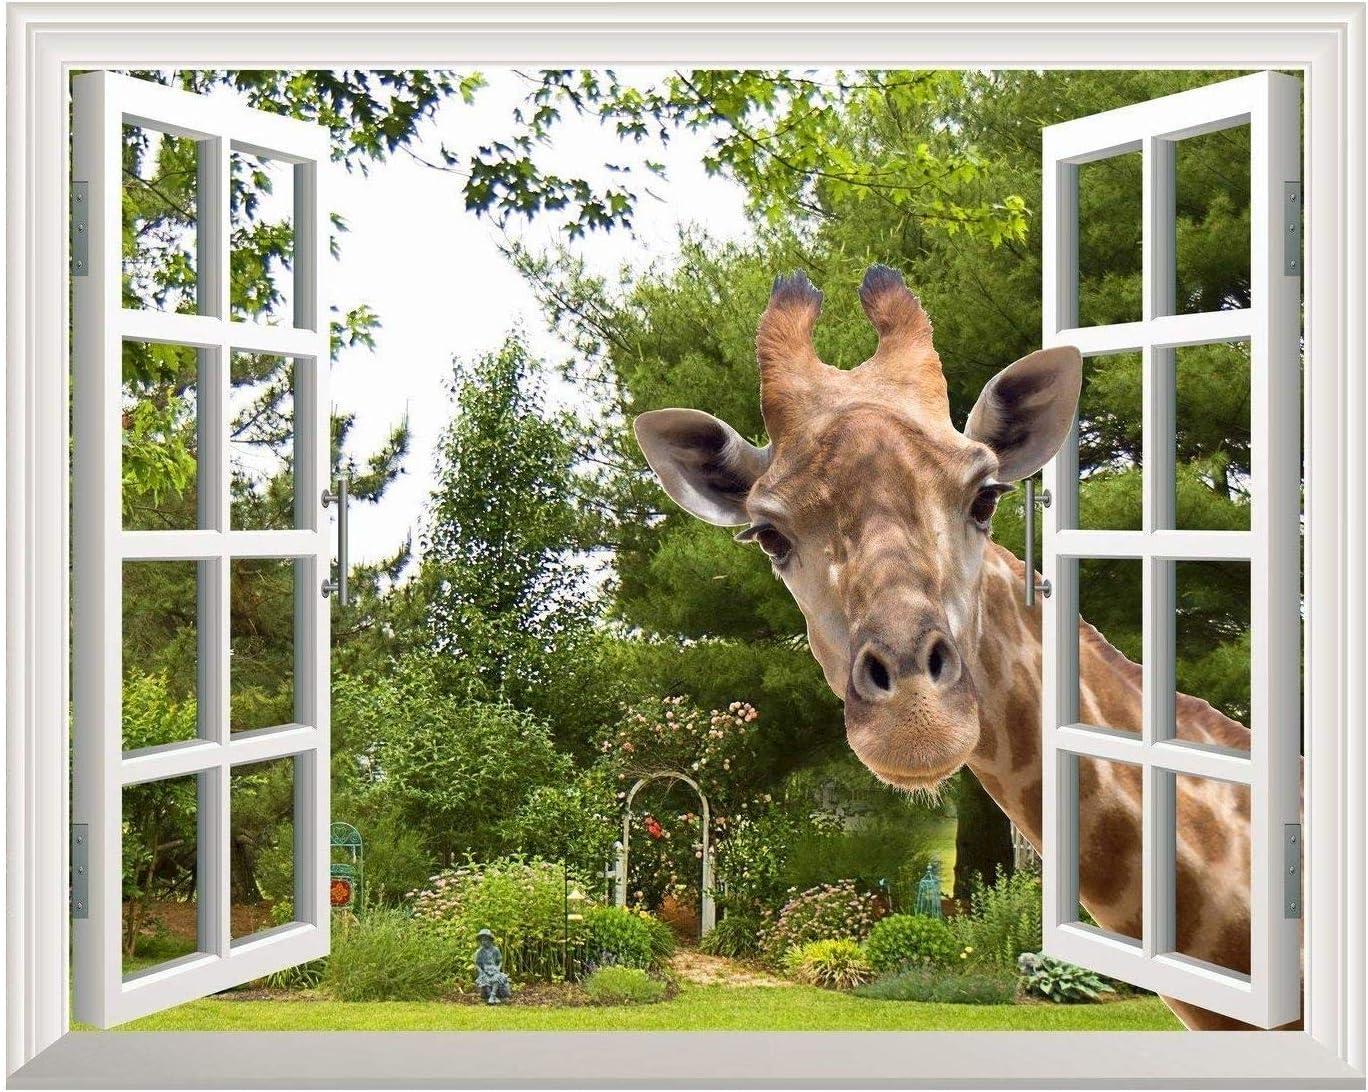 "Wall26 Creative Wall Sticker Removable Wall Art Wall Decal - A Curious Giraffe Sticking Its Head into an Open Window | Cute & Funny Wall Mural - 24""x32"""